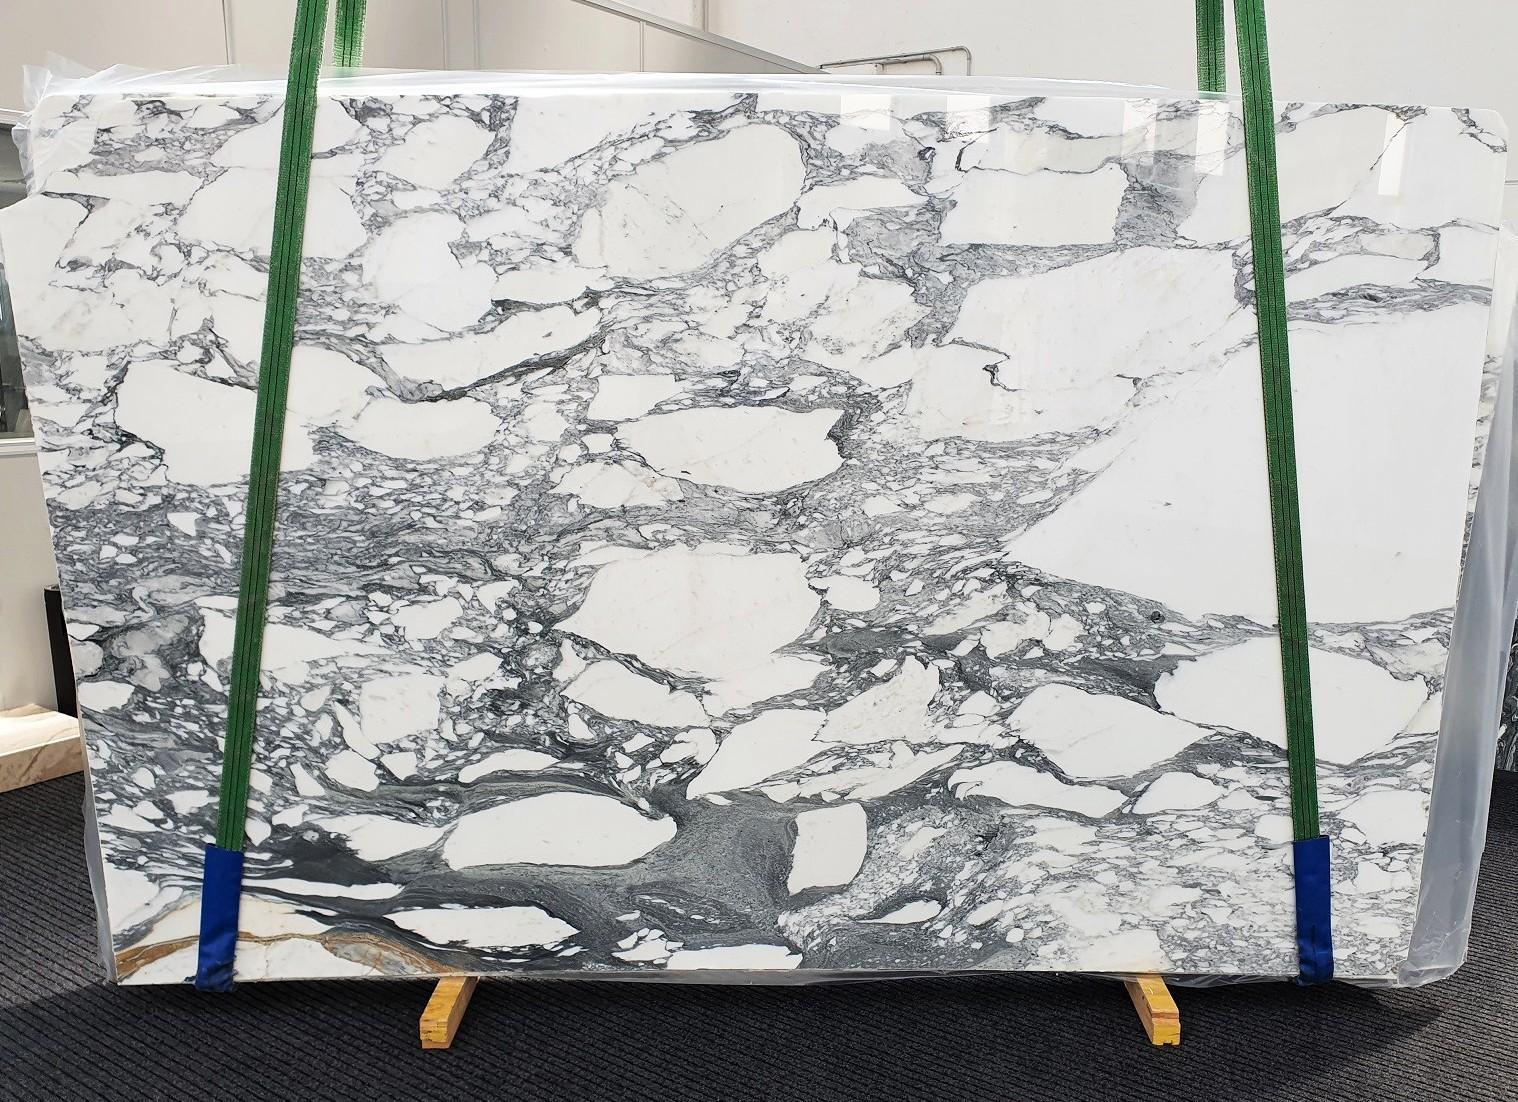 ARABESCATO CORCHIA polierte Unmaßplatten 1433 aus Natur Marmor , Slab #17: Lieferung Veneto, Italien